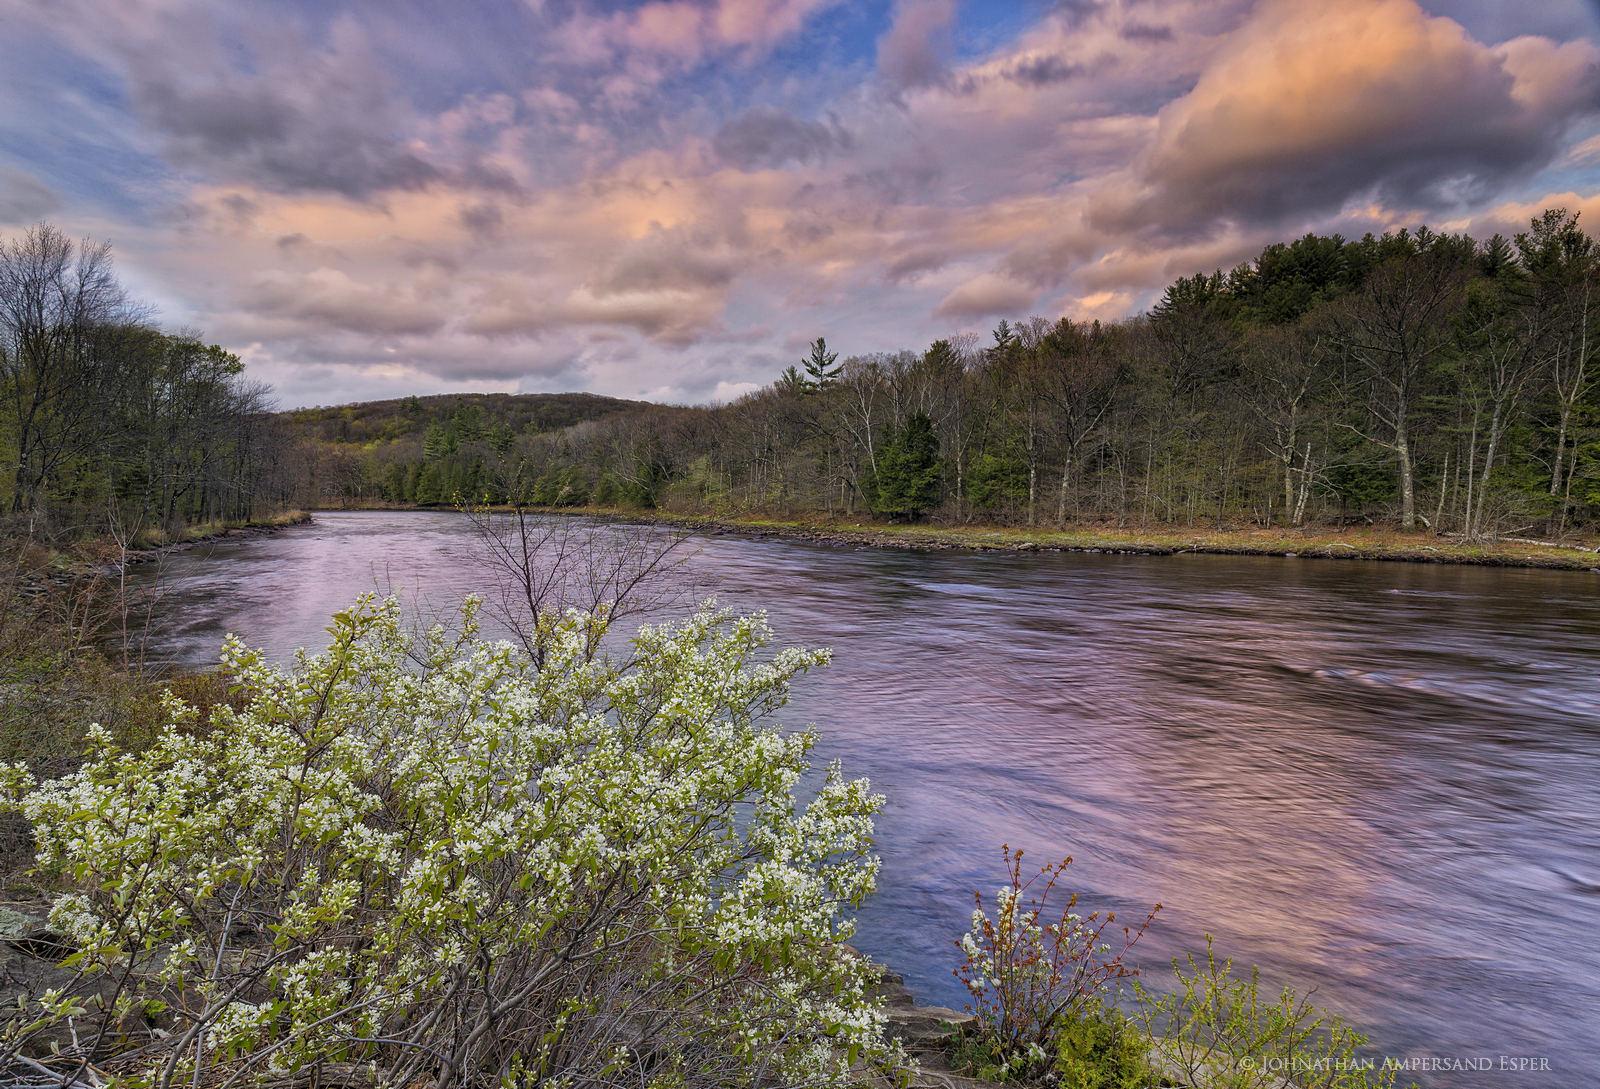 Hudson River,North River,spring,2016,spring 2016,flowering bush,flowers,sunset, photo